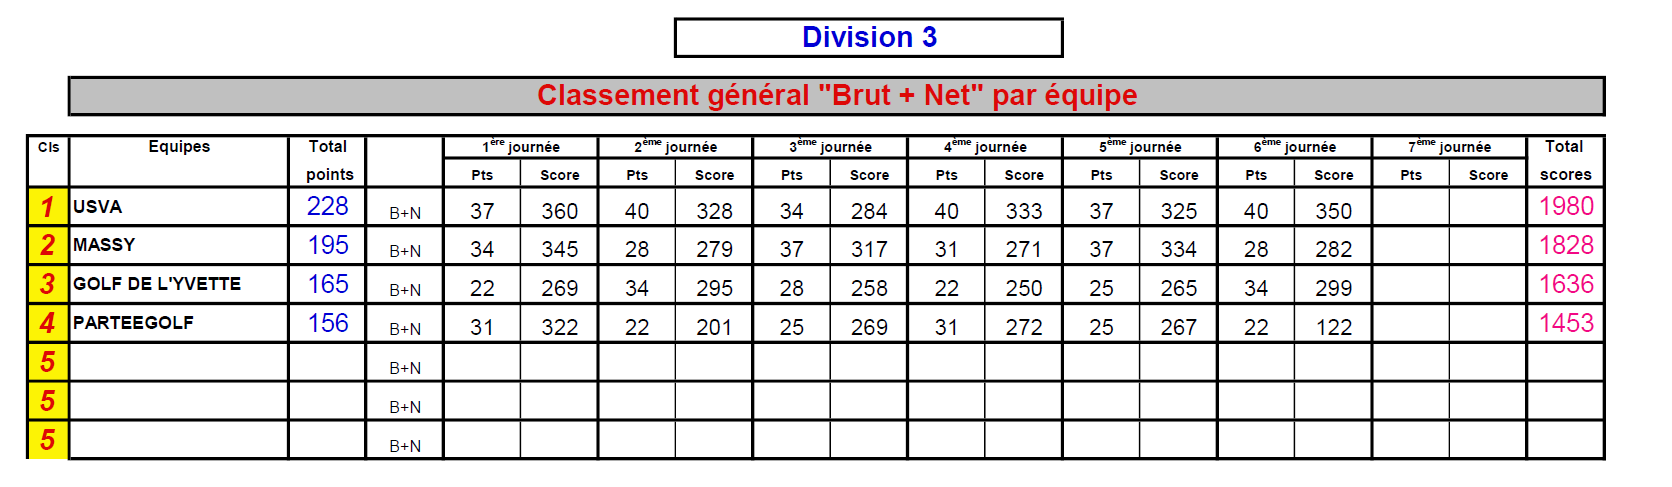 Brut et Net total.PNG